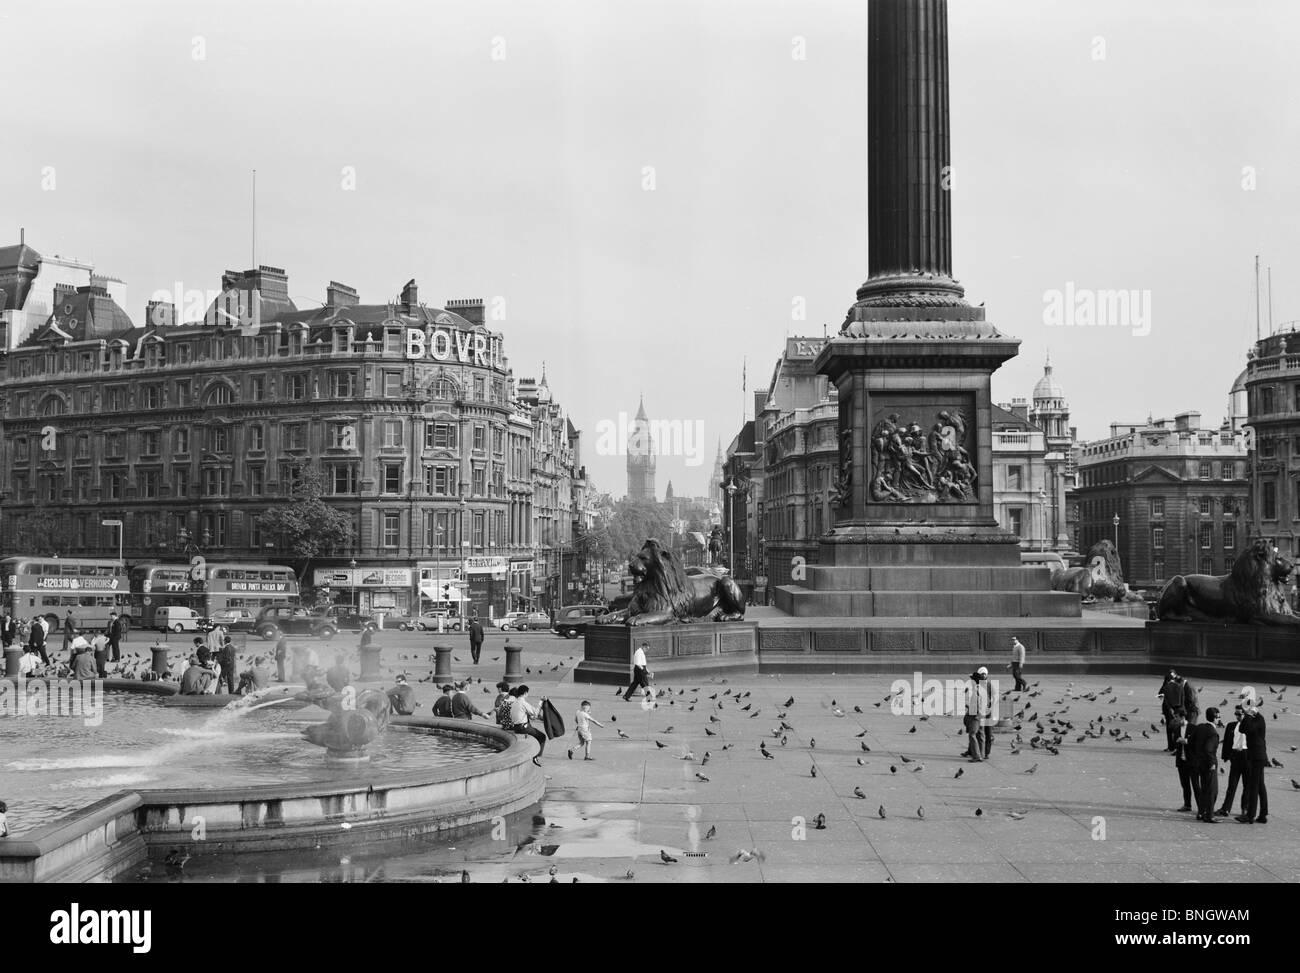 England, London, Trafalgar Square - Stock Image